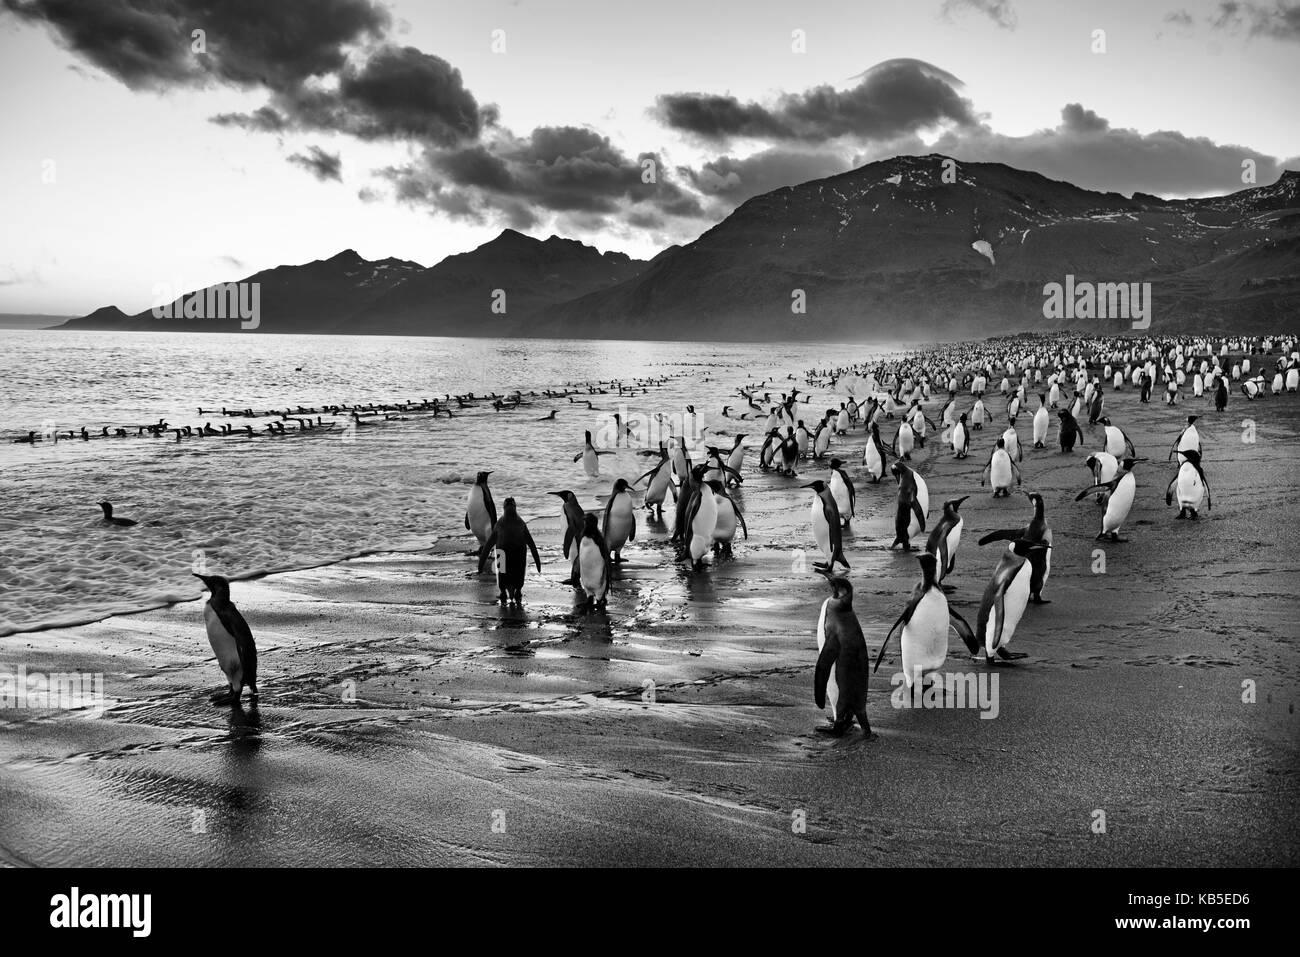 King Penguin Aptenodytes patagonicus St Andrews Bay South Georgia January - Stock Image